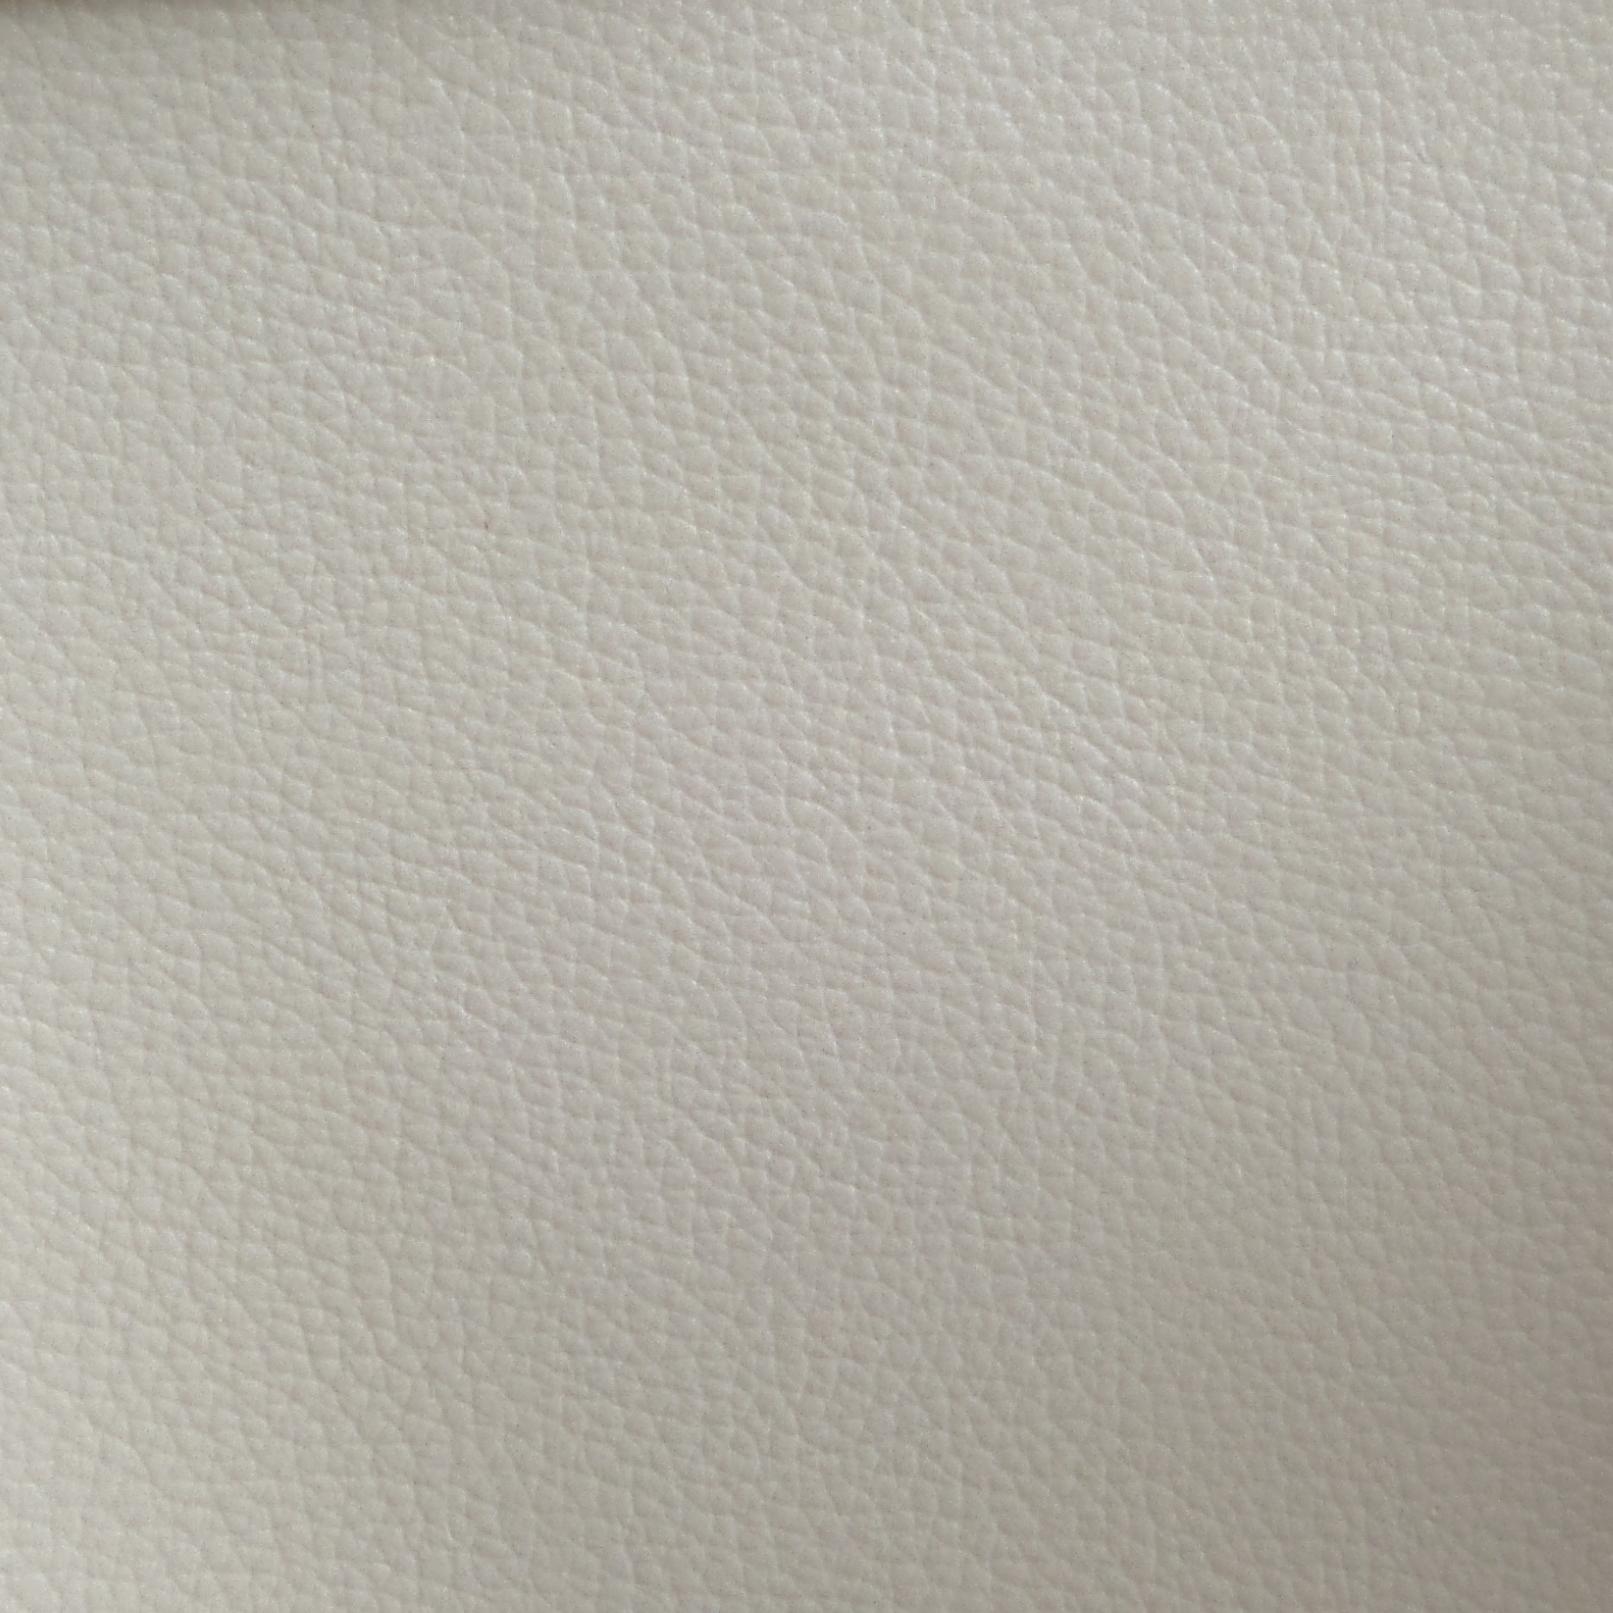 Venty Cream Leather Sample